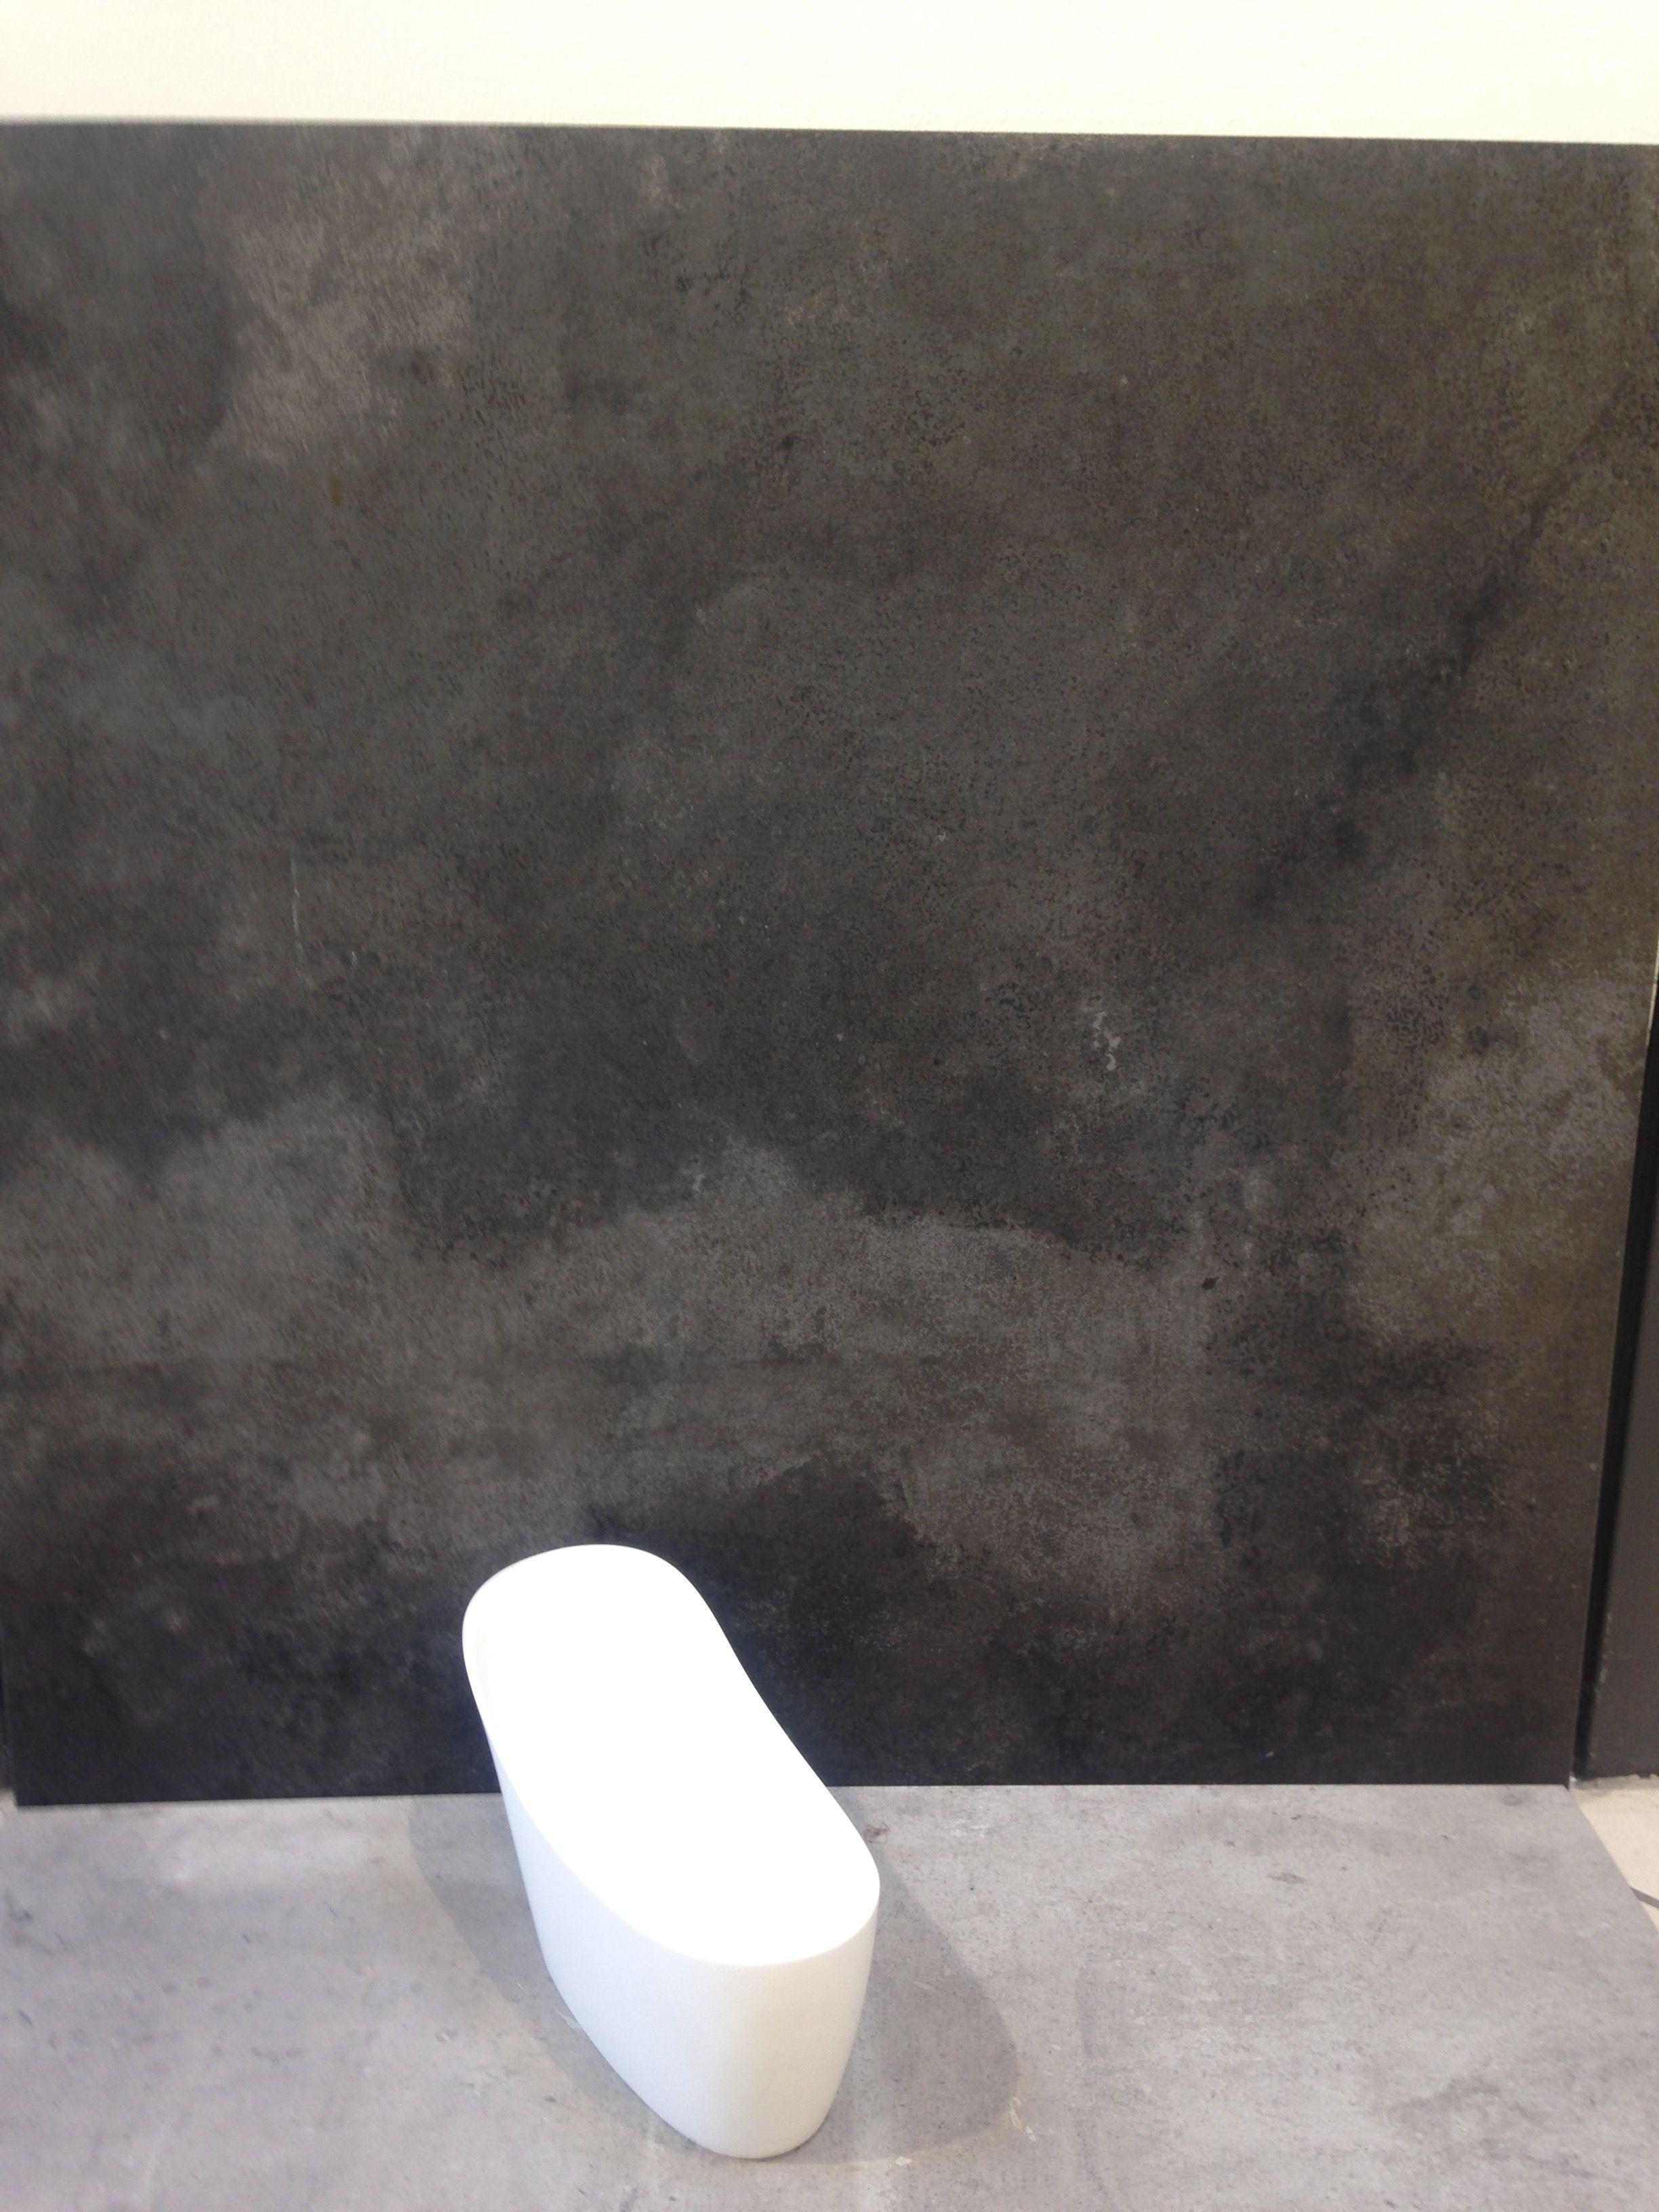 århus bad og fliser Århus bad og fliser: Denne italienske flise på 60x60 er valgt til  århus bad og fliser